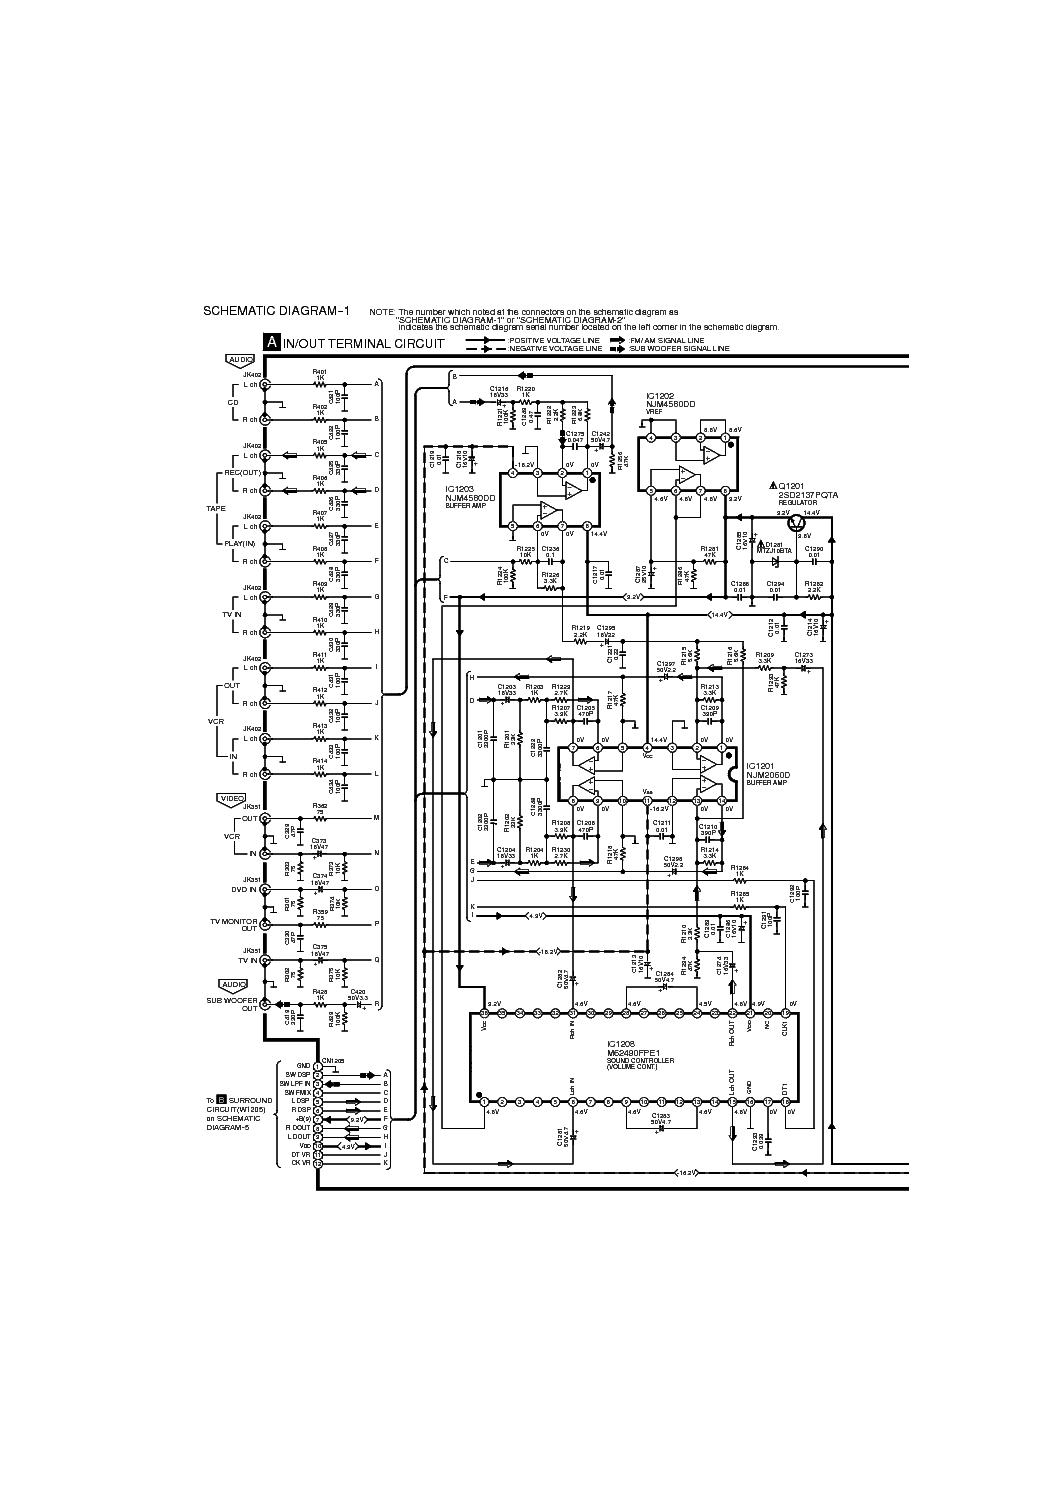 Technics Sa Dx940 Service Manual Download  Schematics  Eeprom  Repair Info For Electronics Experts